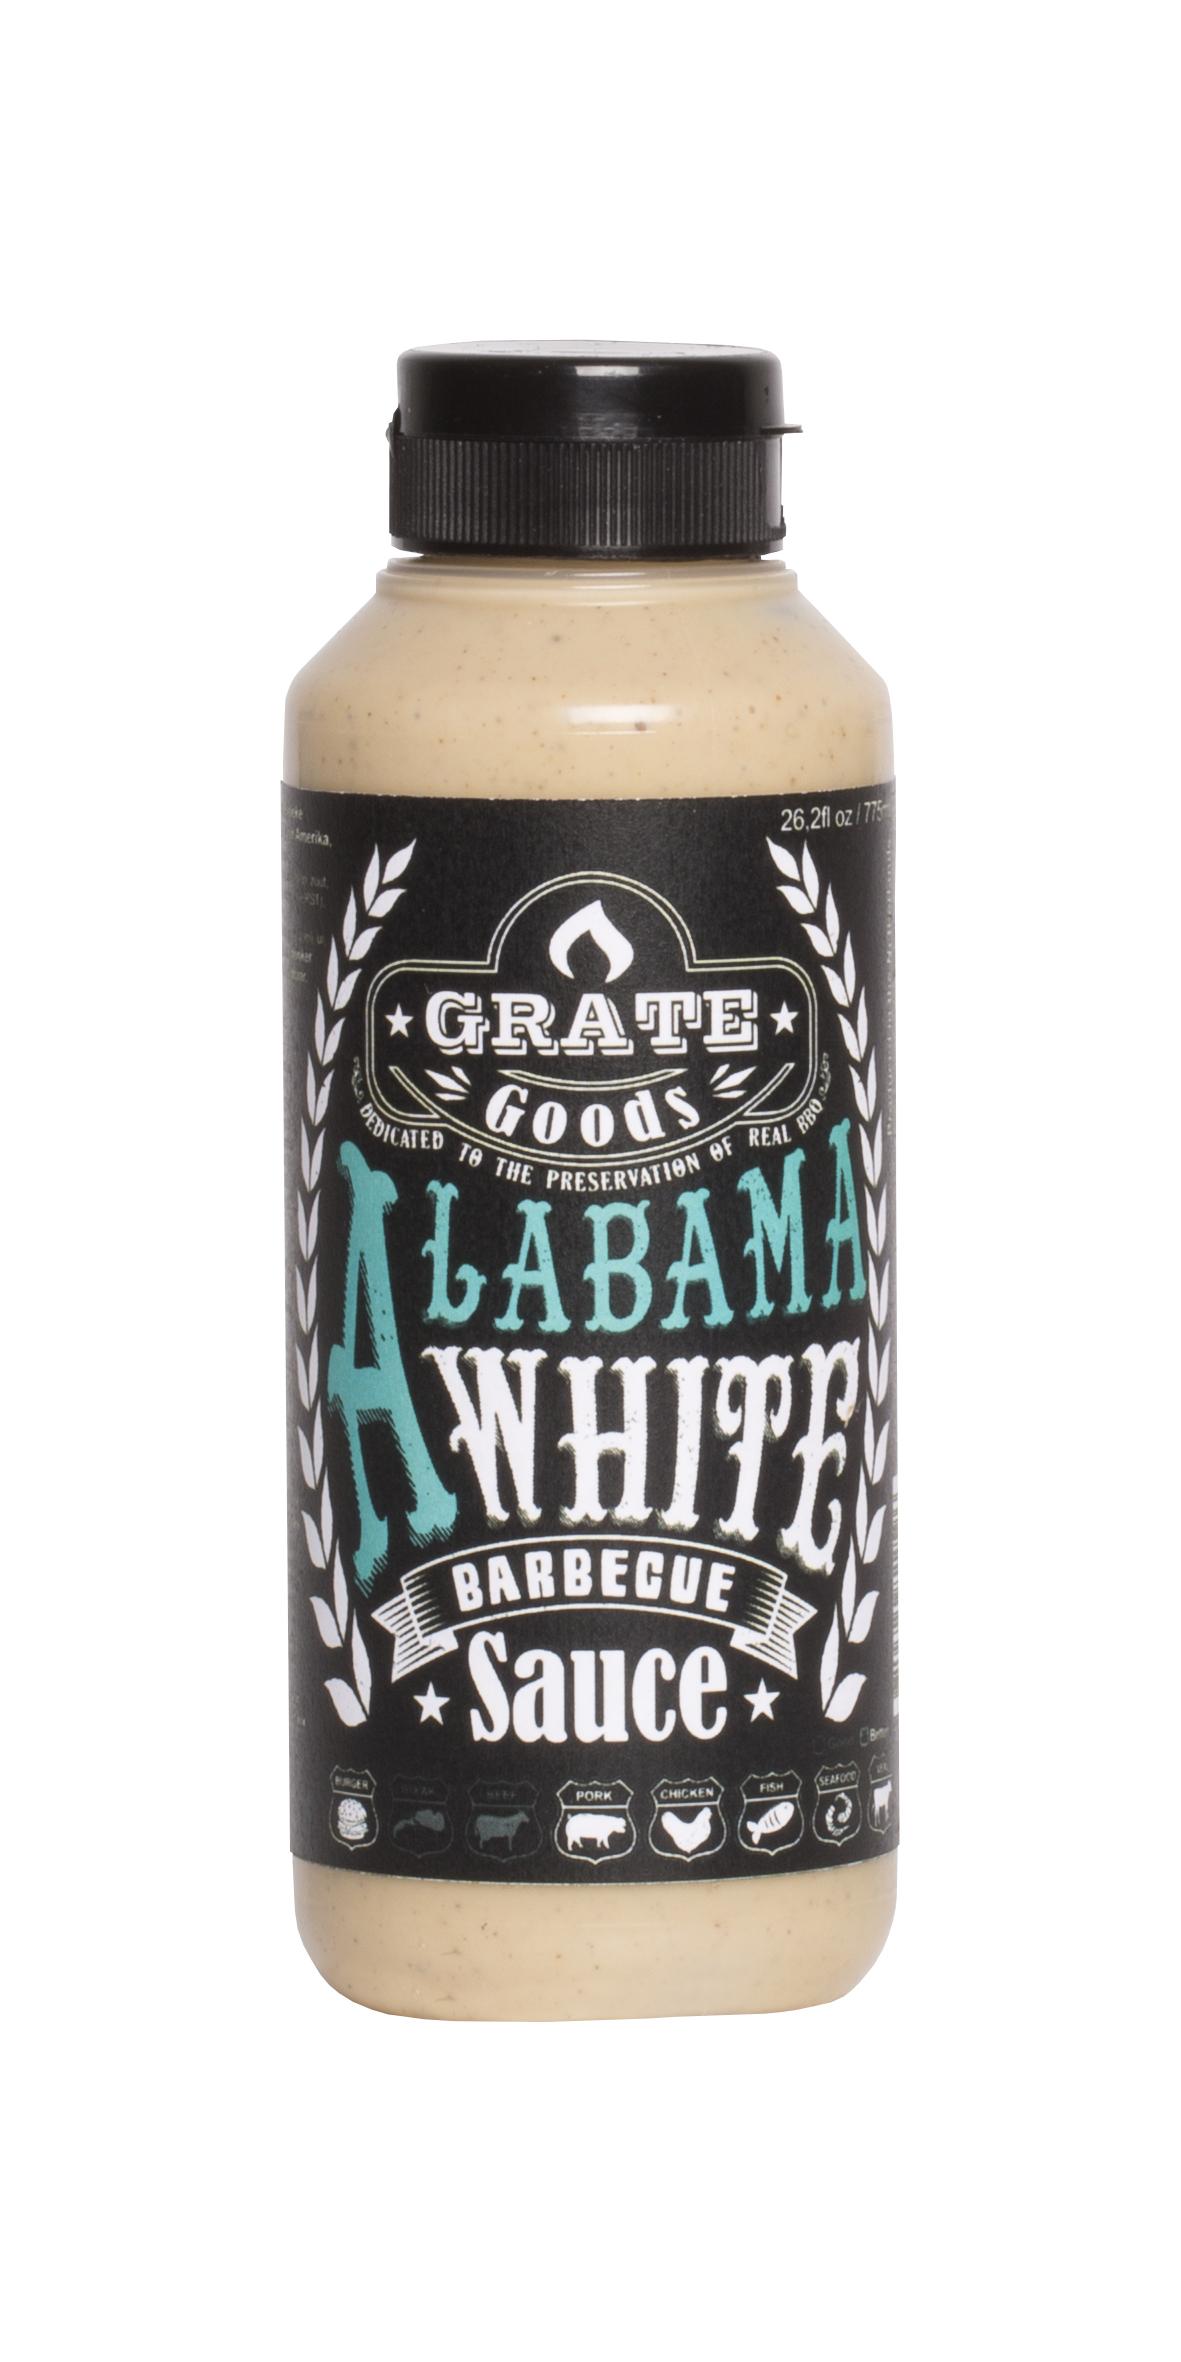 Grate Goods Alabama White BBQ Sauce 265ml